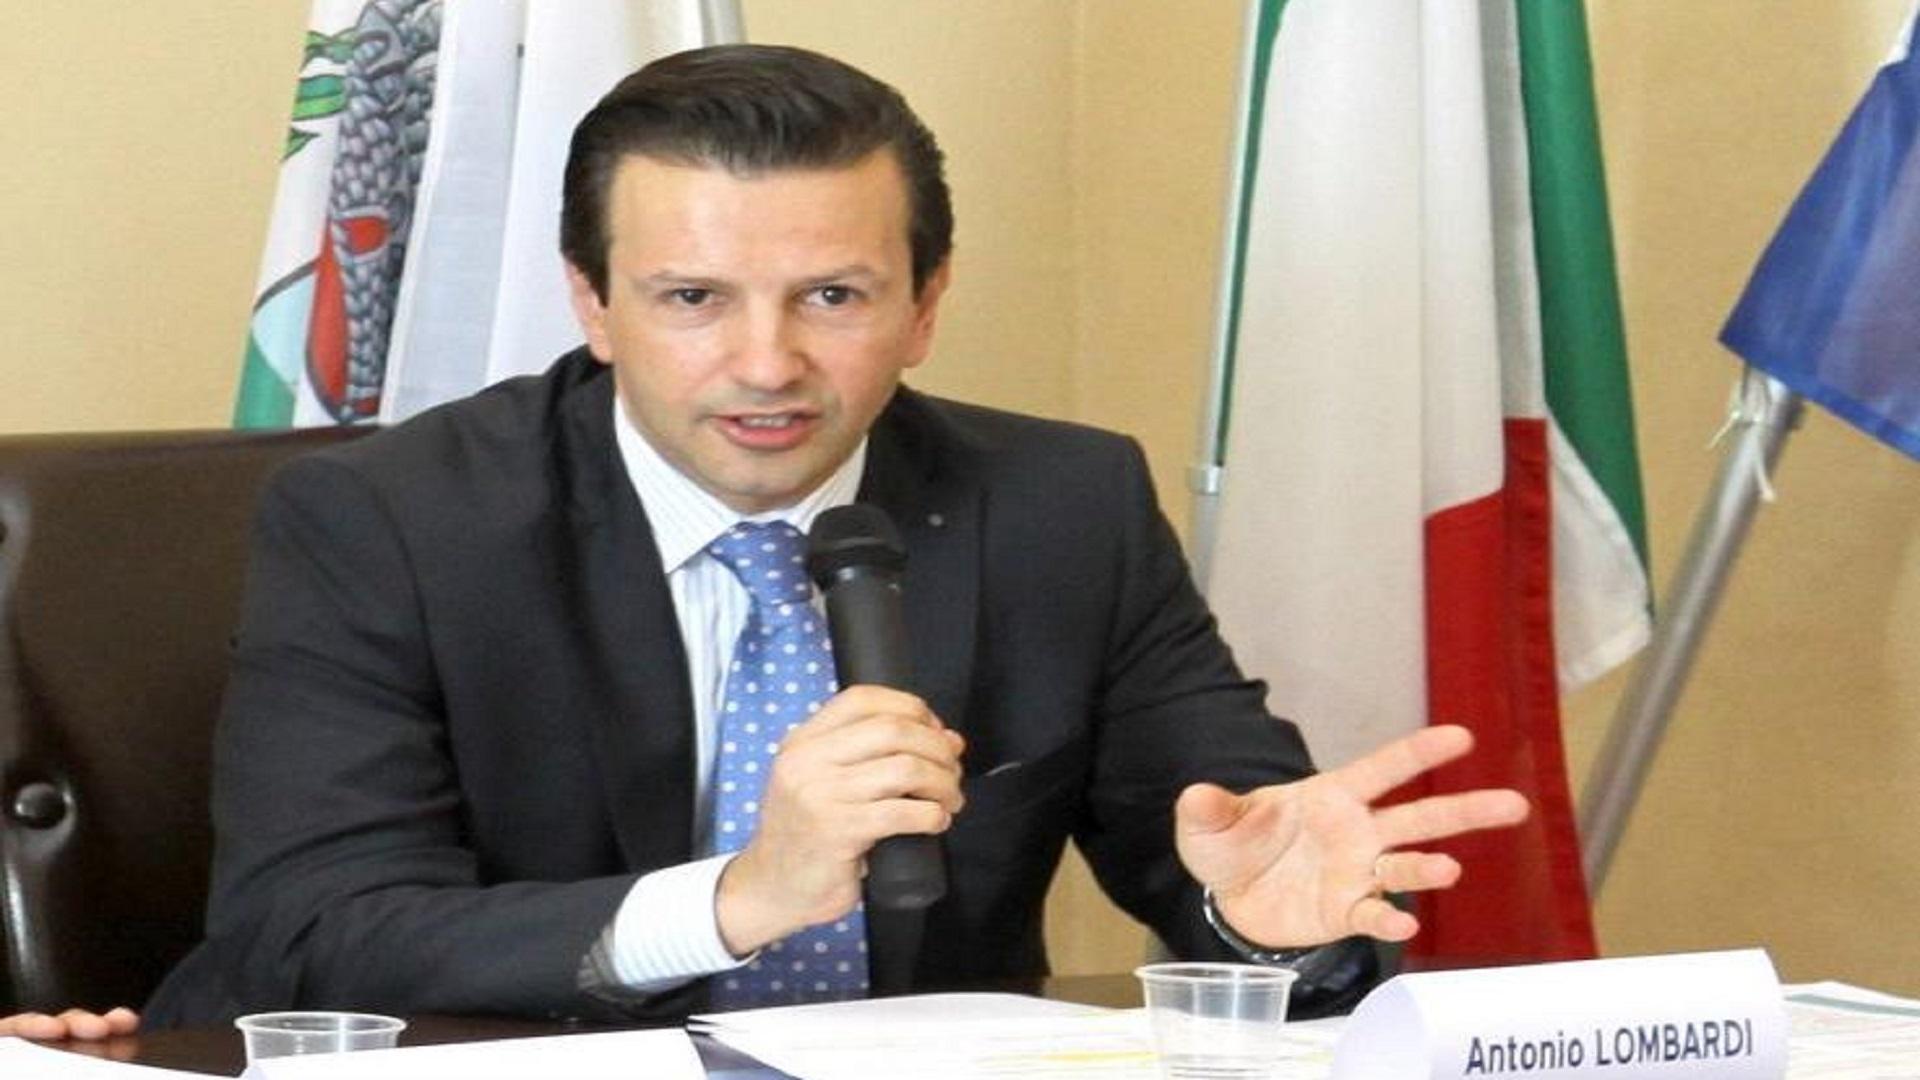 L-imprenditore-Antonio-Lombardi